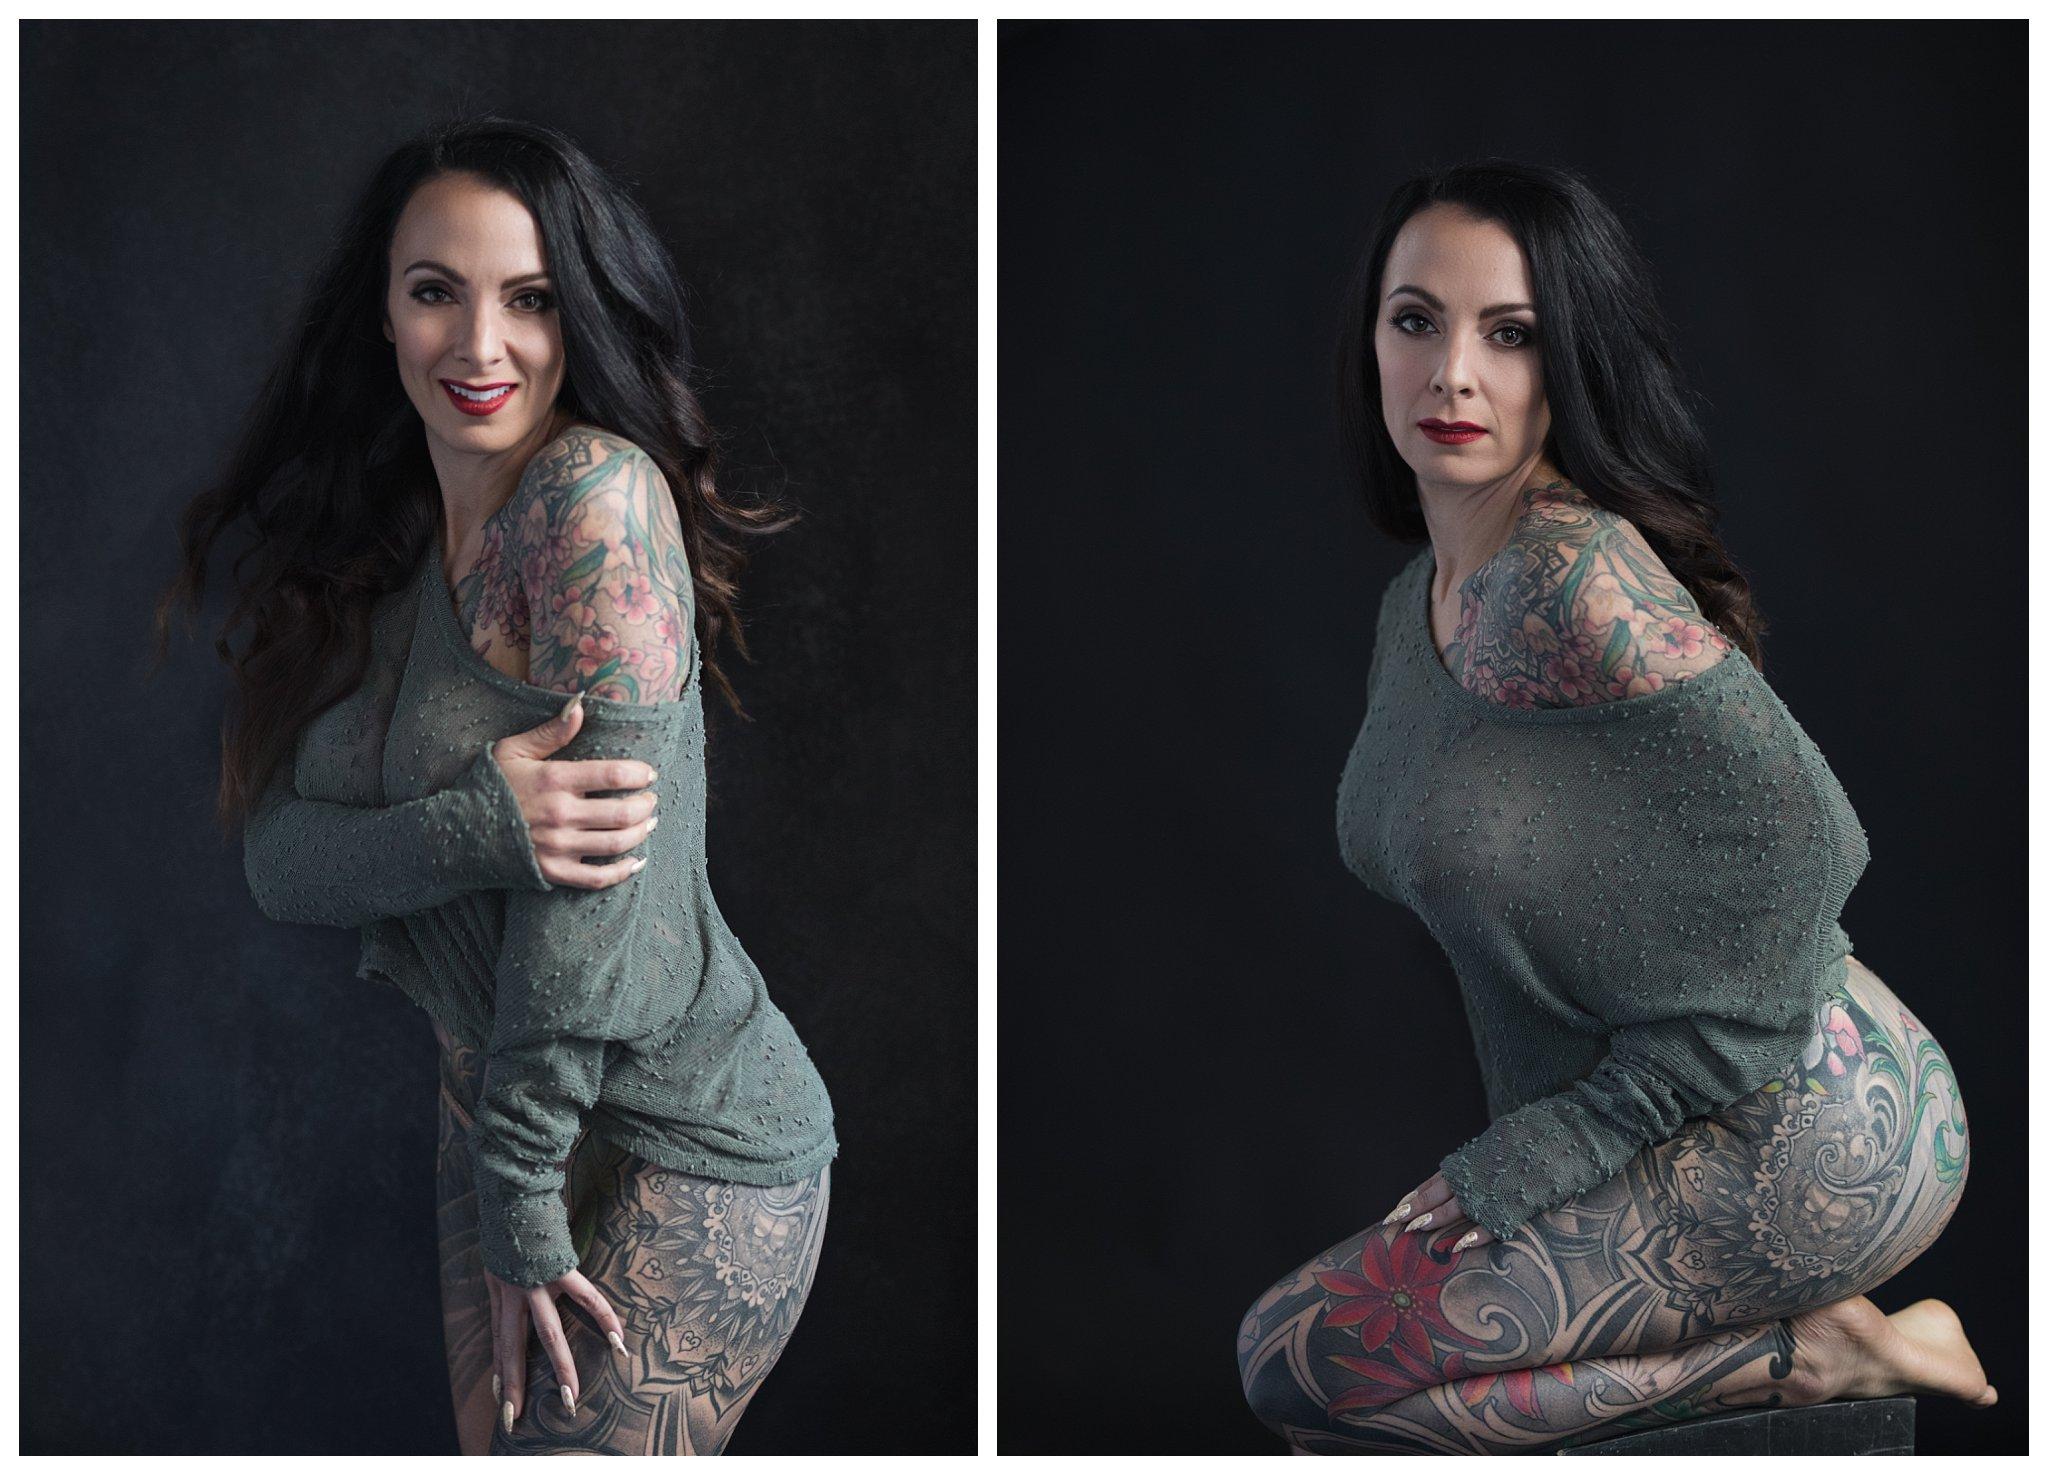 sexy photos tattoo woman oregon